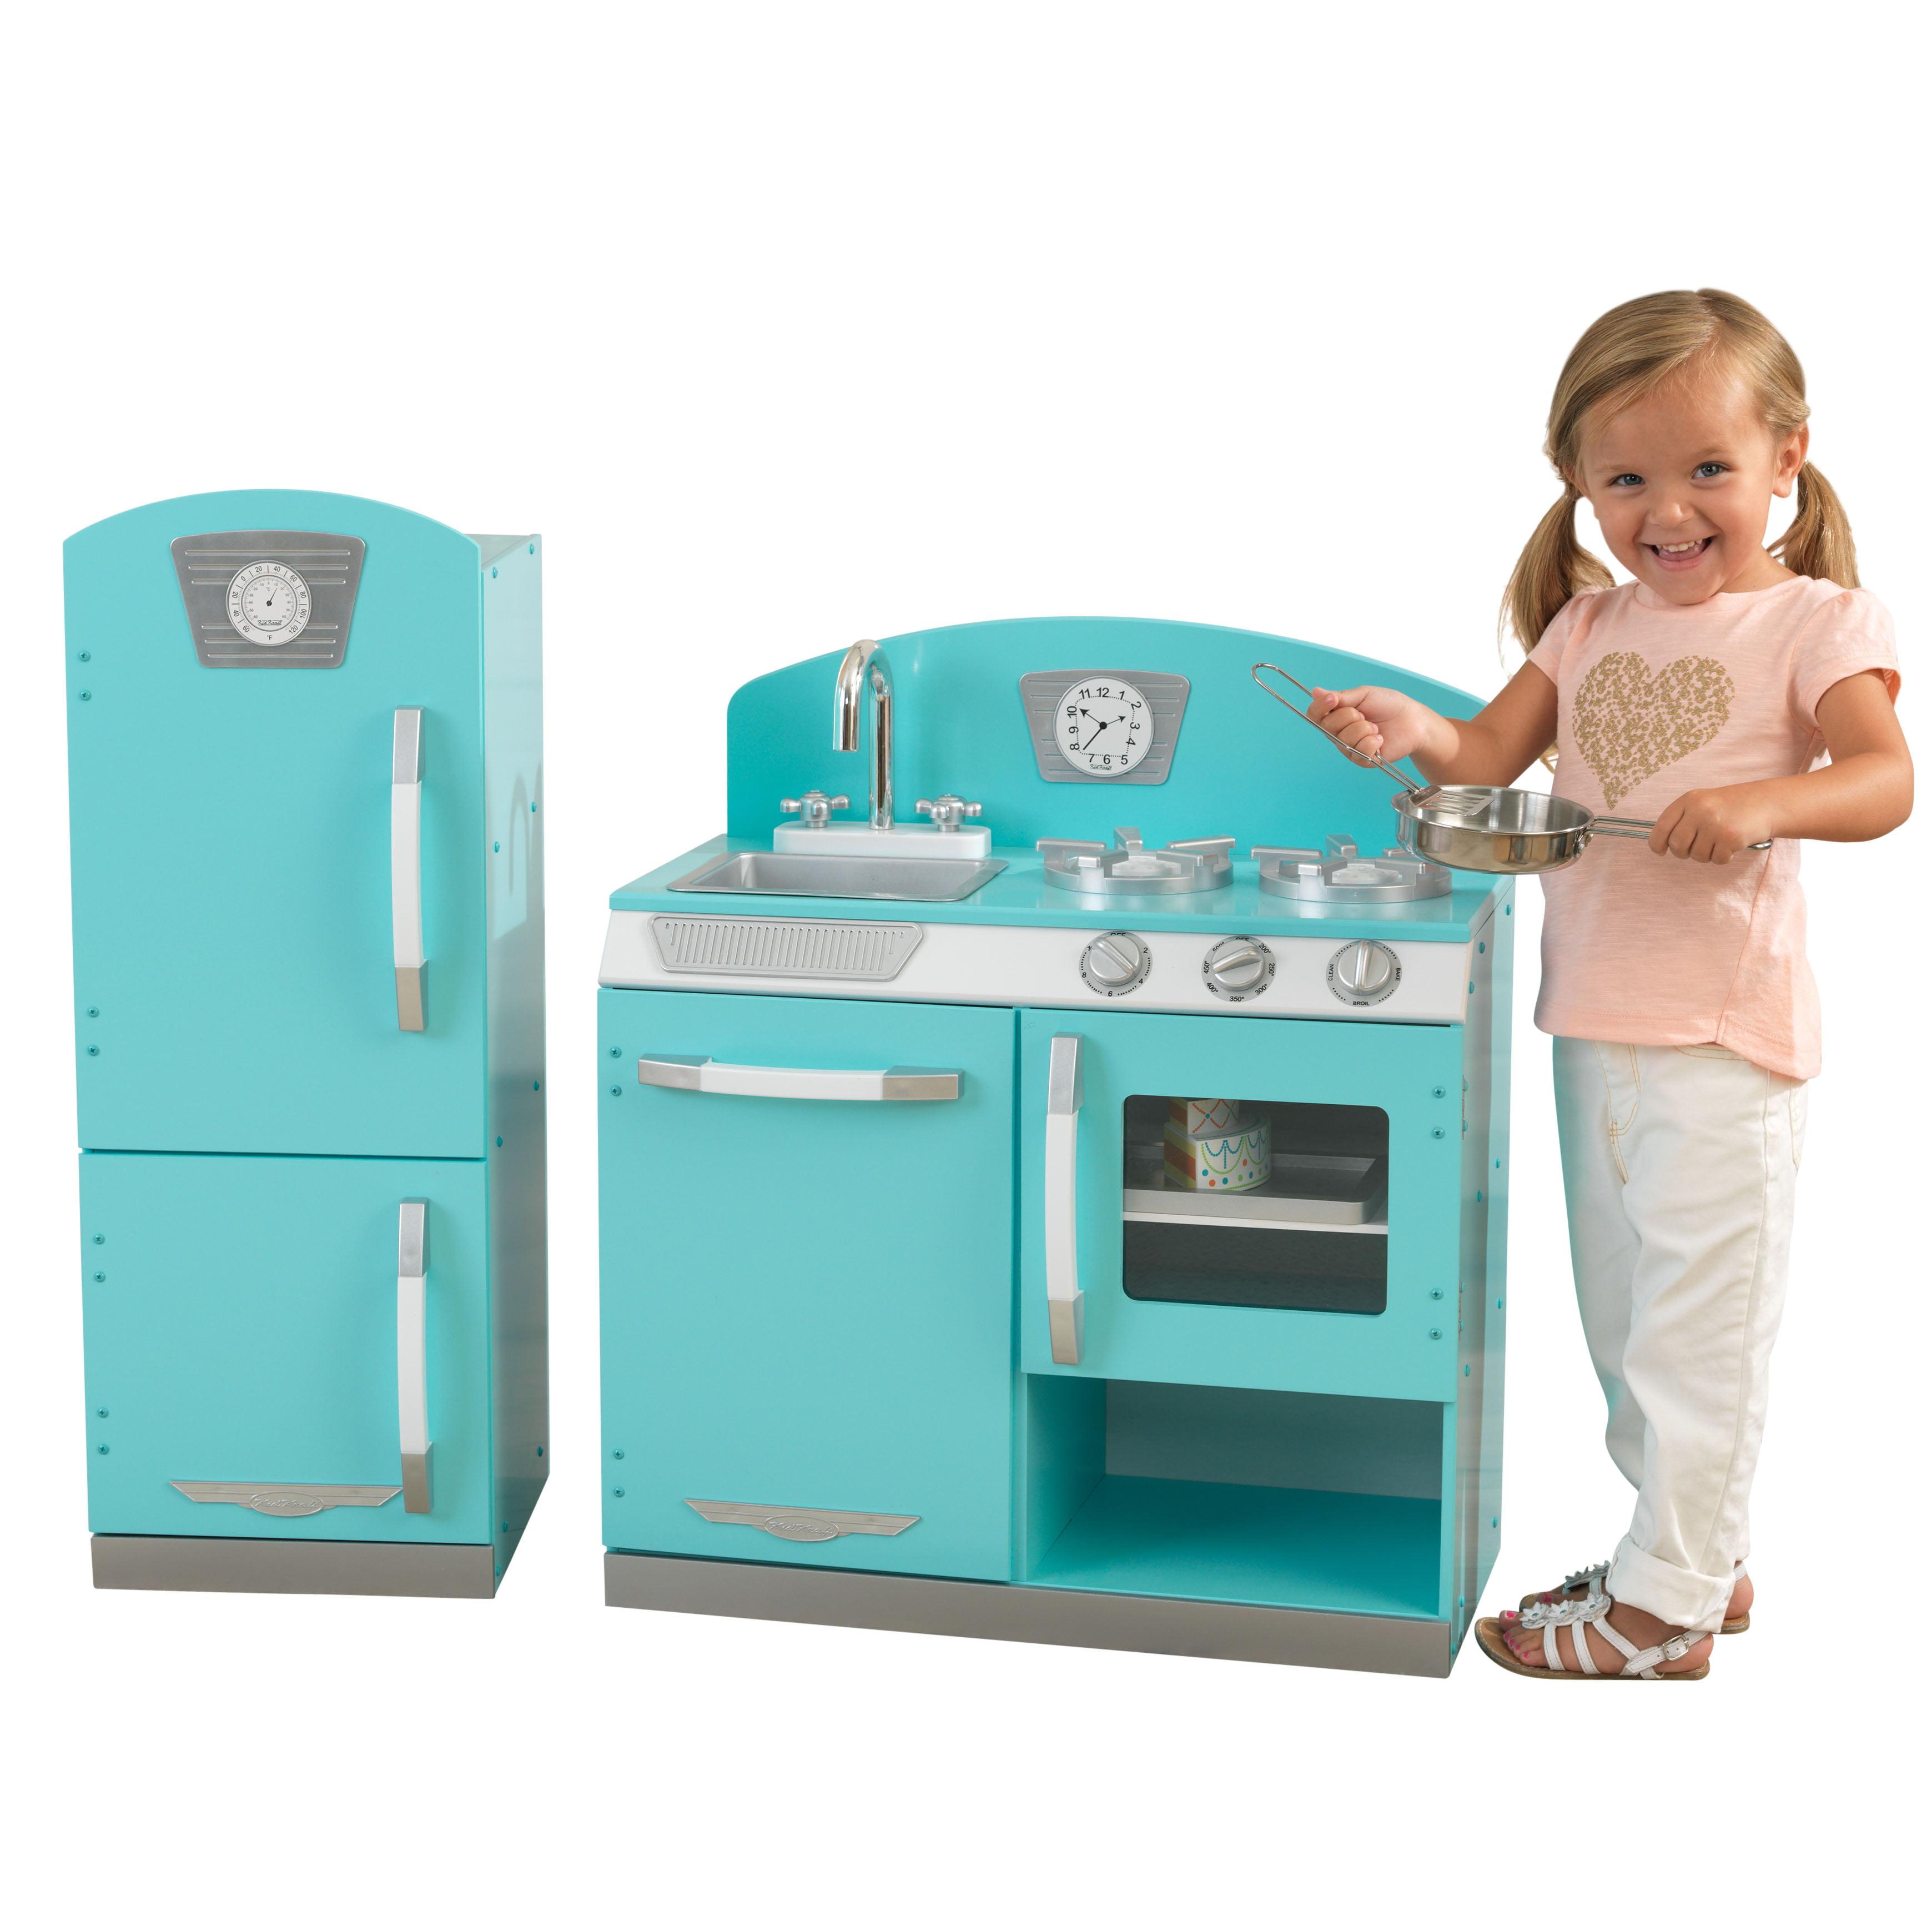 Kidkraft Blue Retro Kitchen And Refrigerator Walmart Com